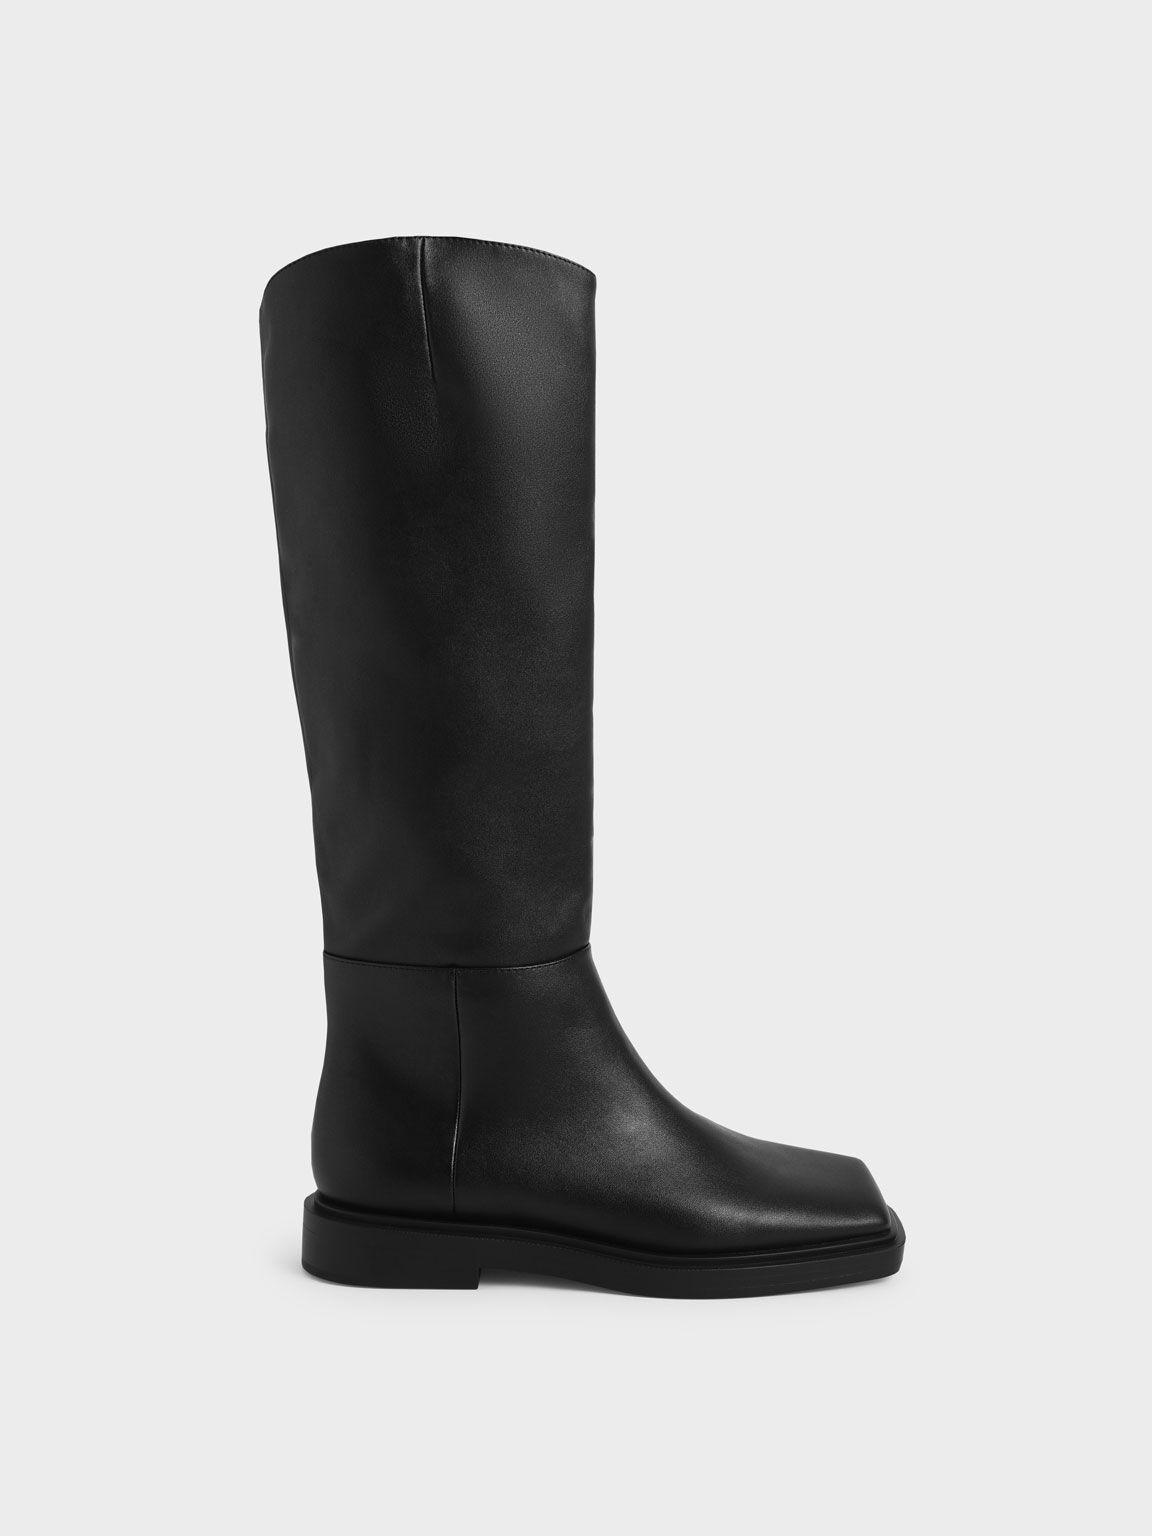 Square Toe Knee High Boots, Black, hi-res